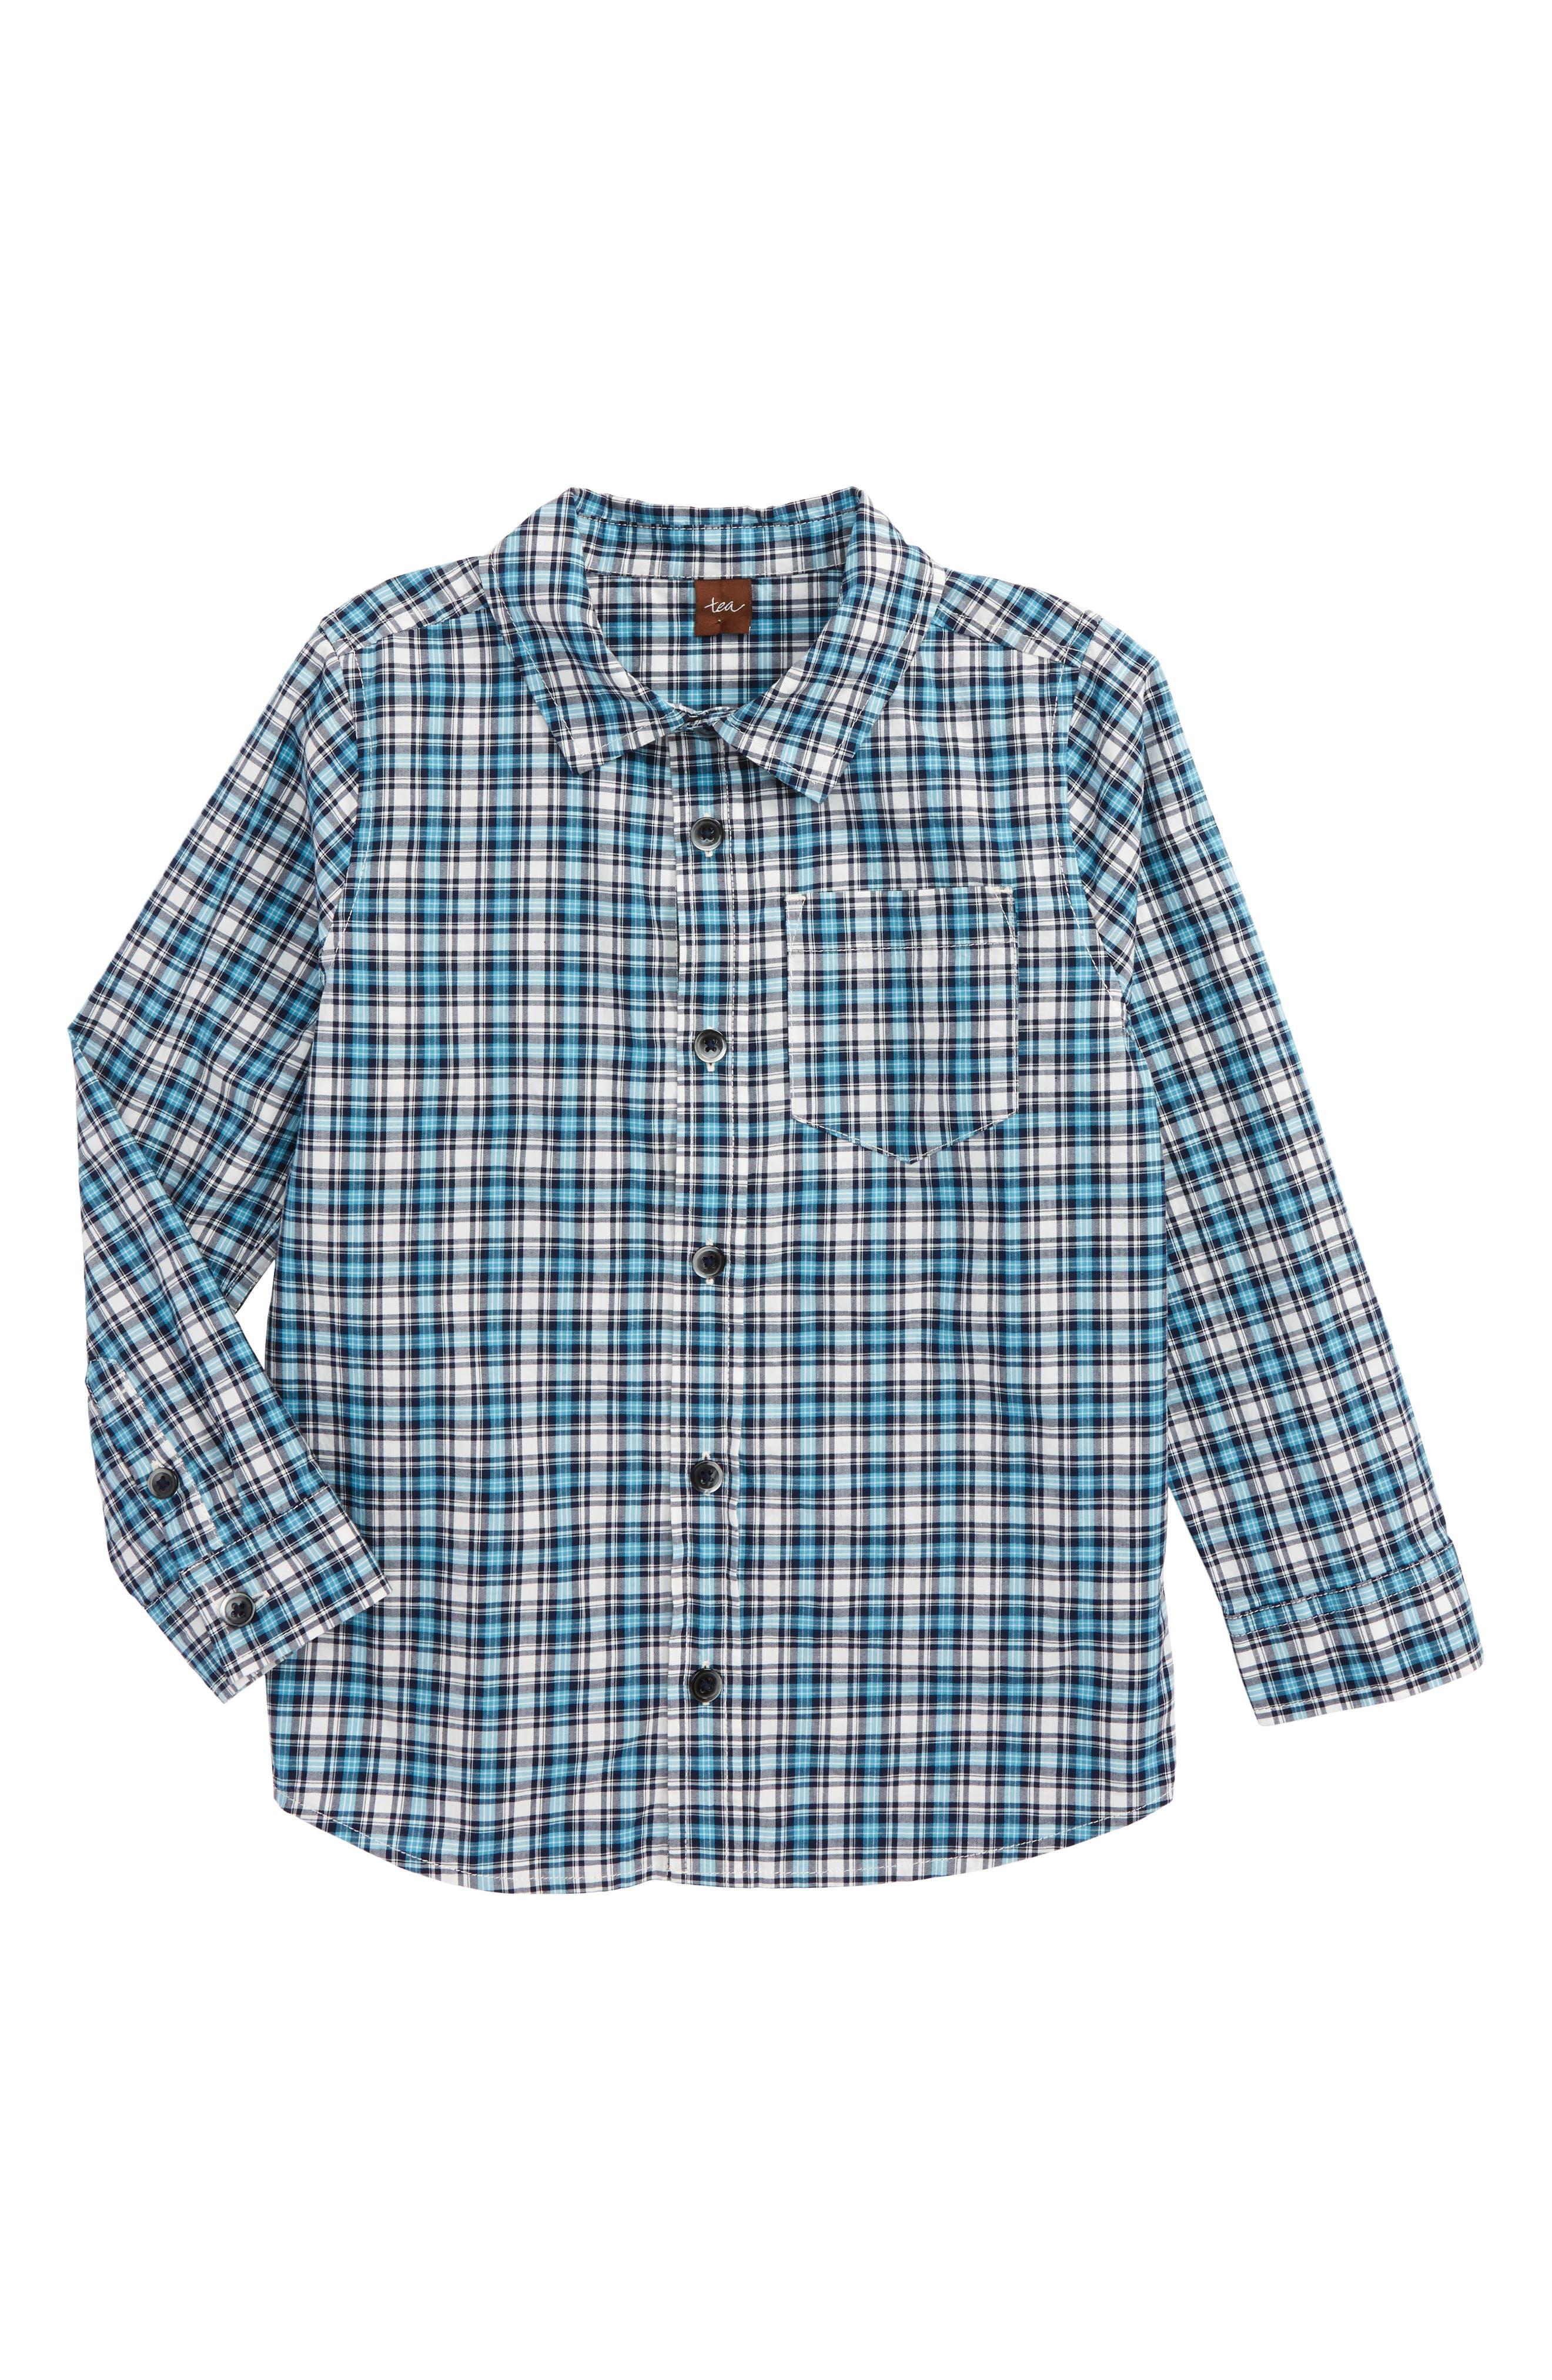 Tea Collection Heath Plaid Woven Shirt (Toddler Boys & Little Boys)